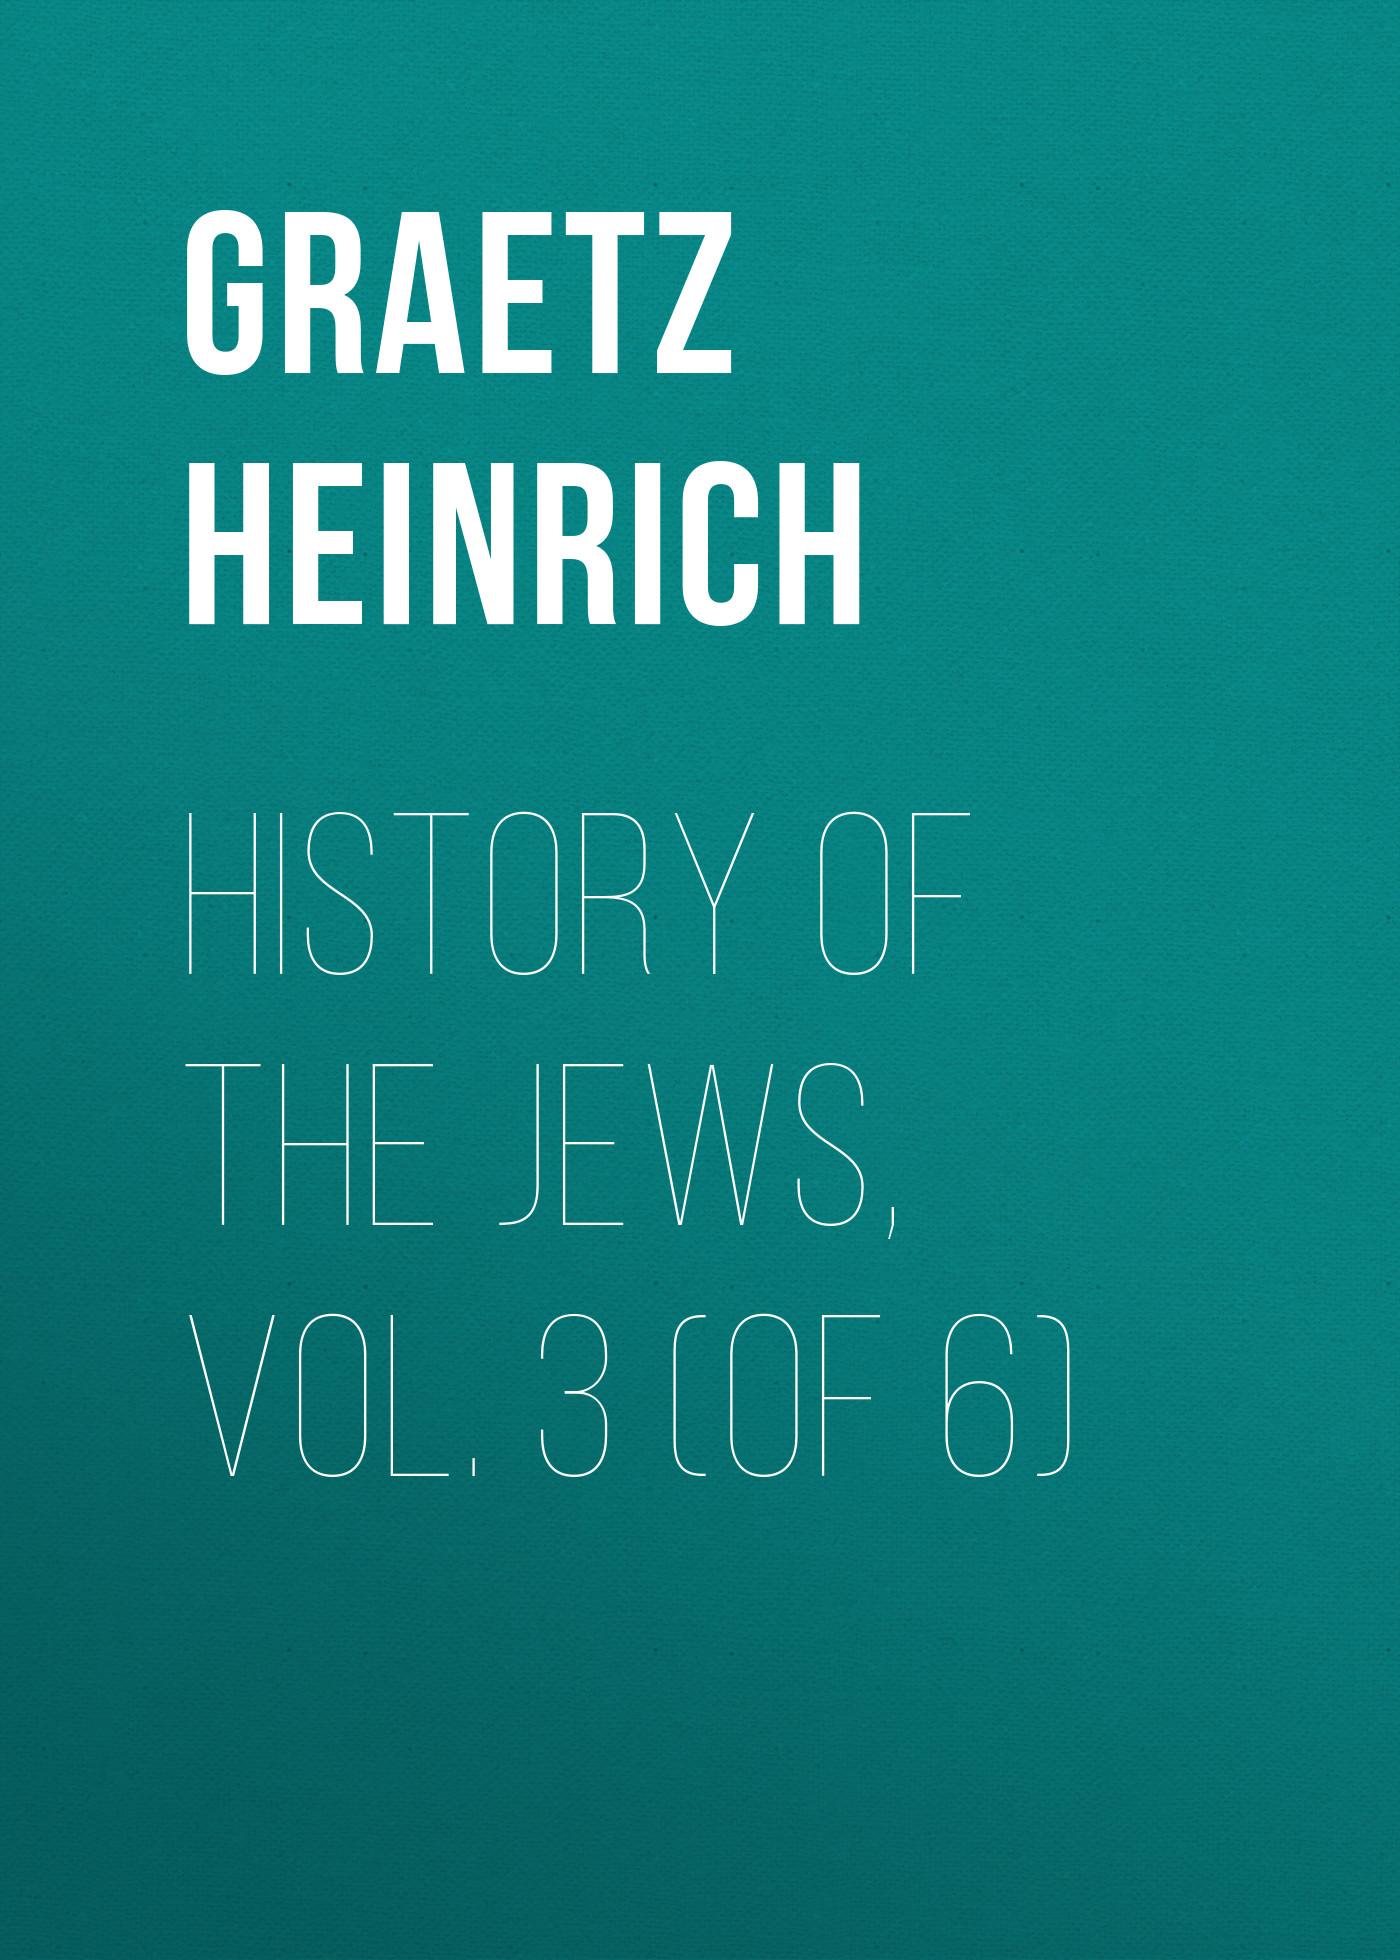 Graetz Heinrich History of the Jews, Vol. 3 (of 6) canarsie – the jews